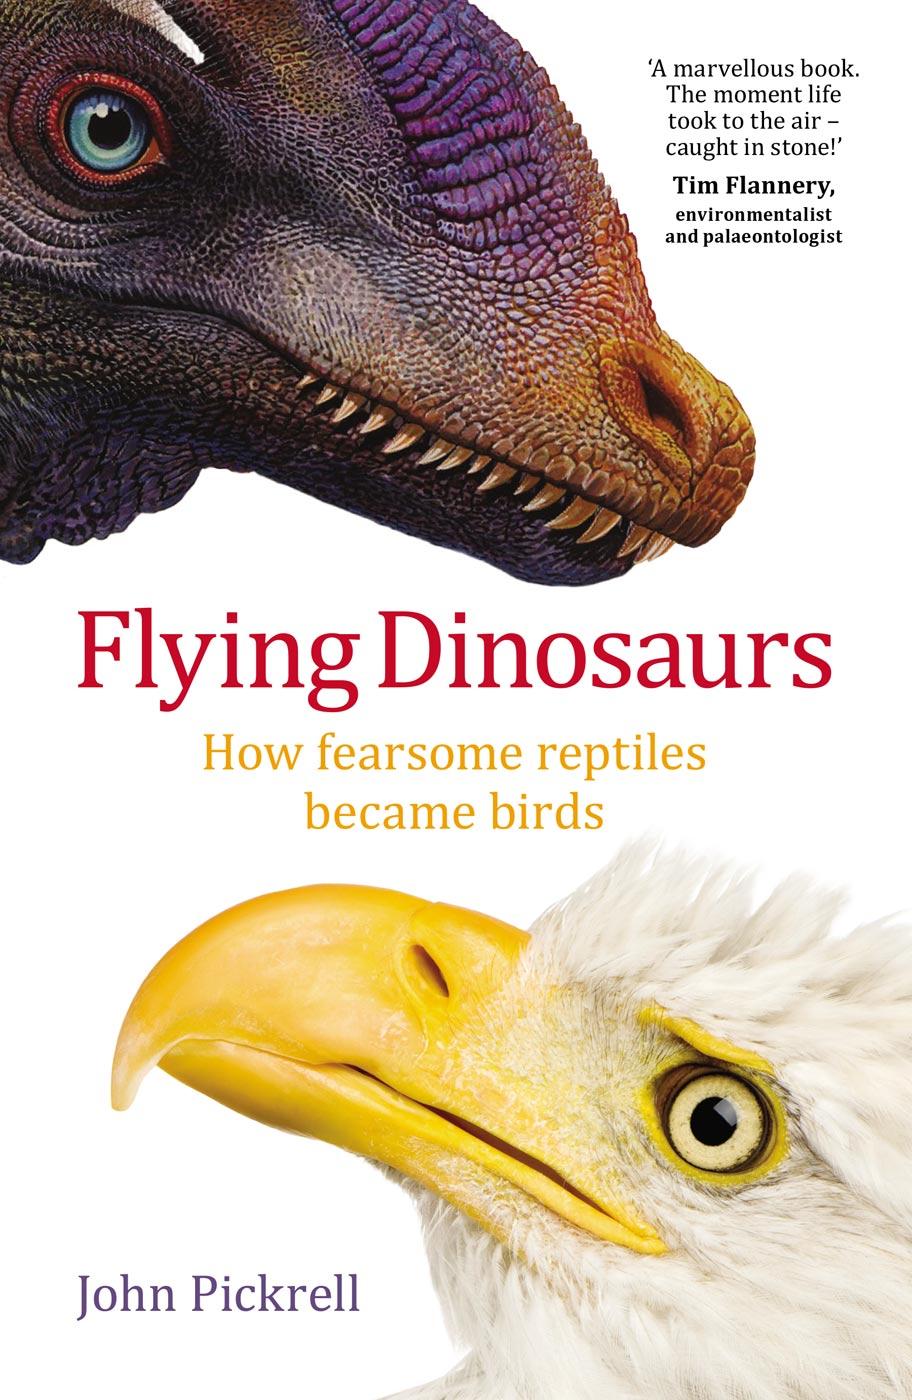 NEW036_Flying_Dinosaurs_Cover_AW_R.jpg